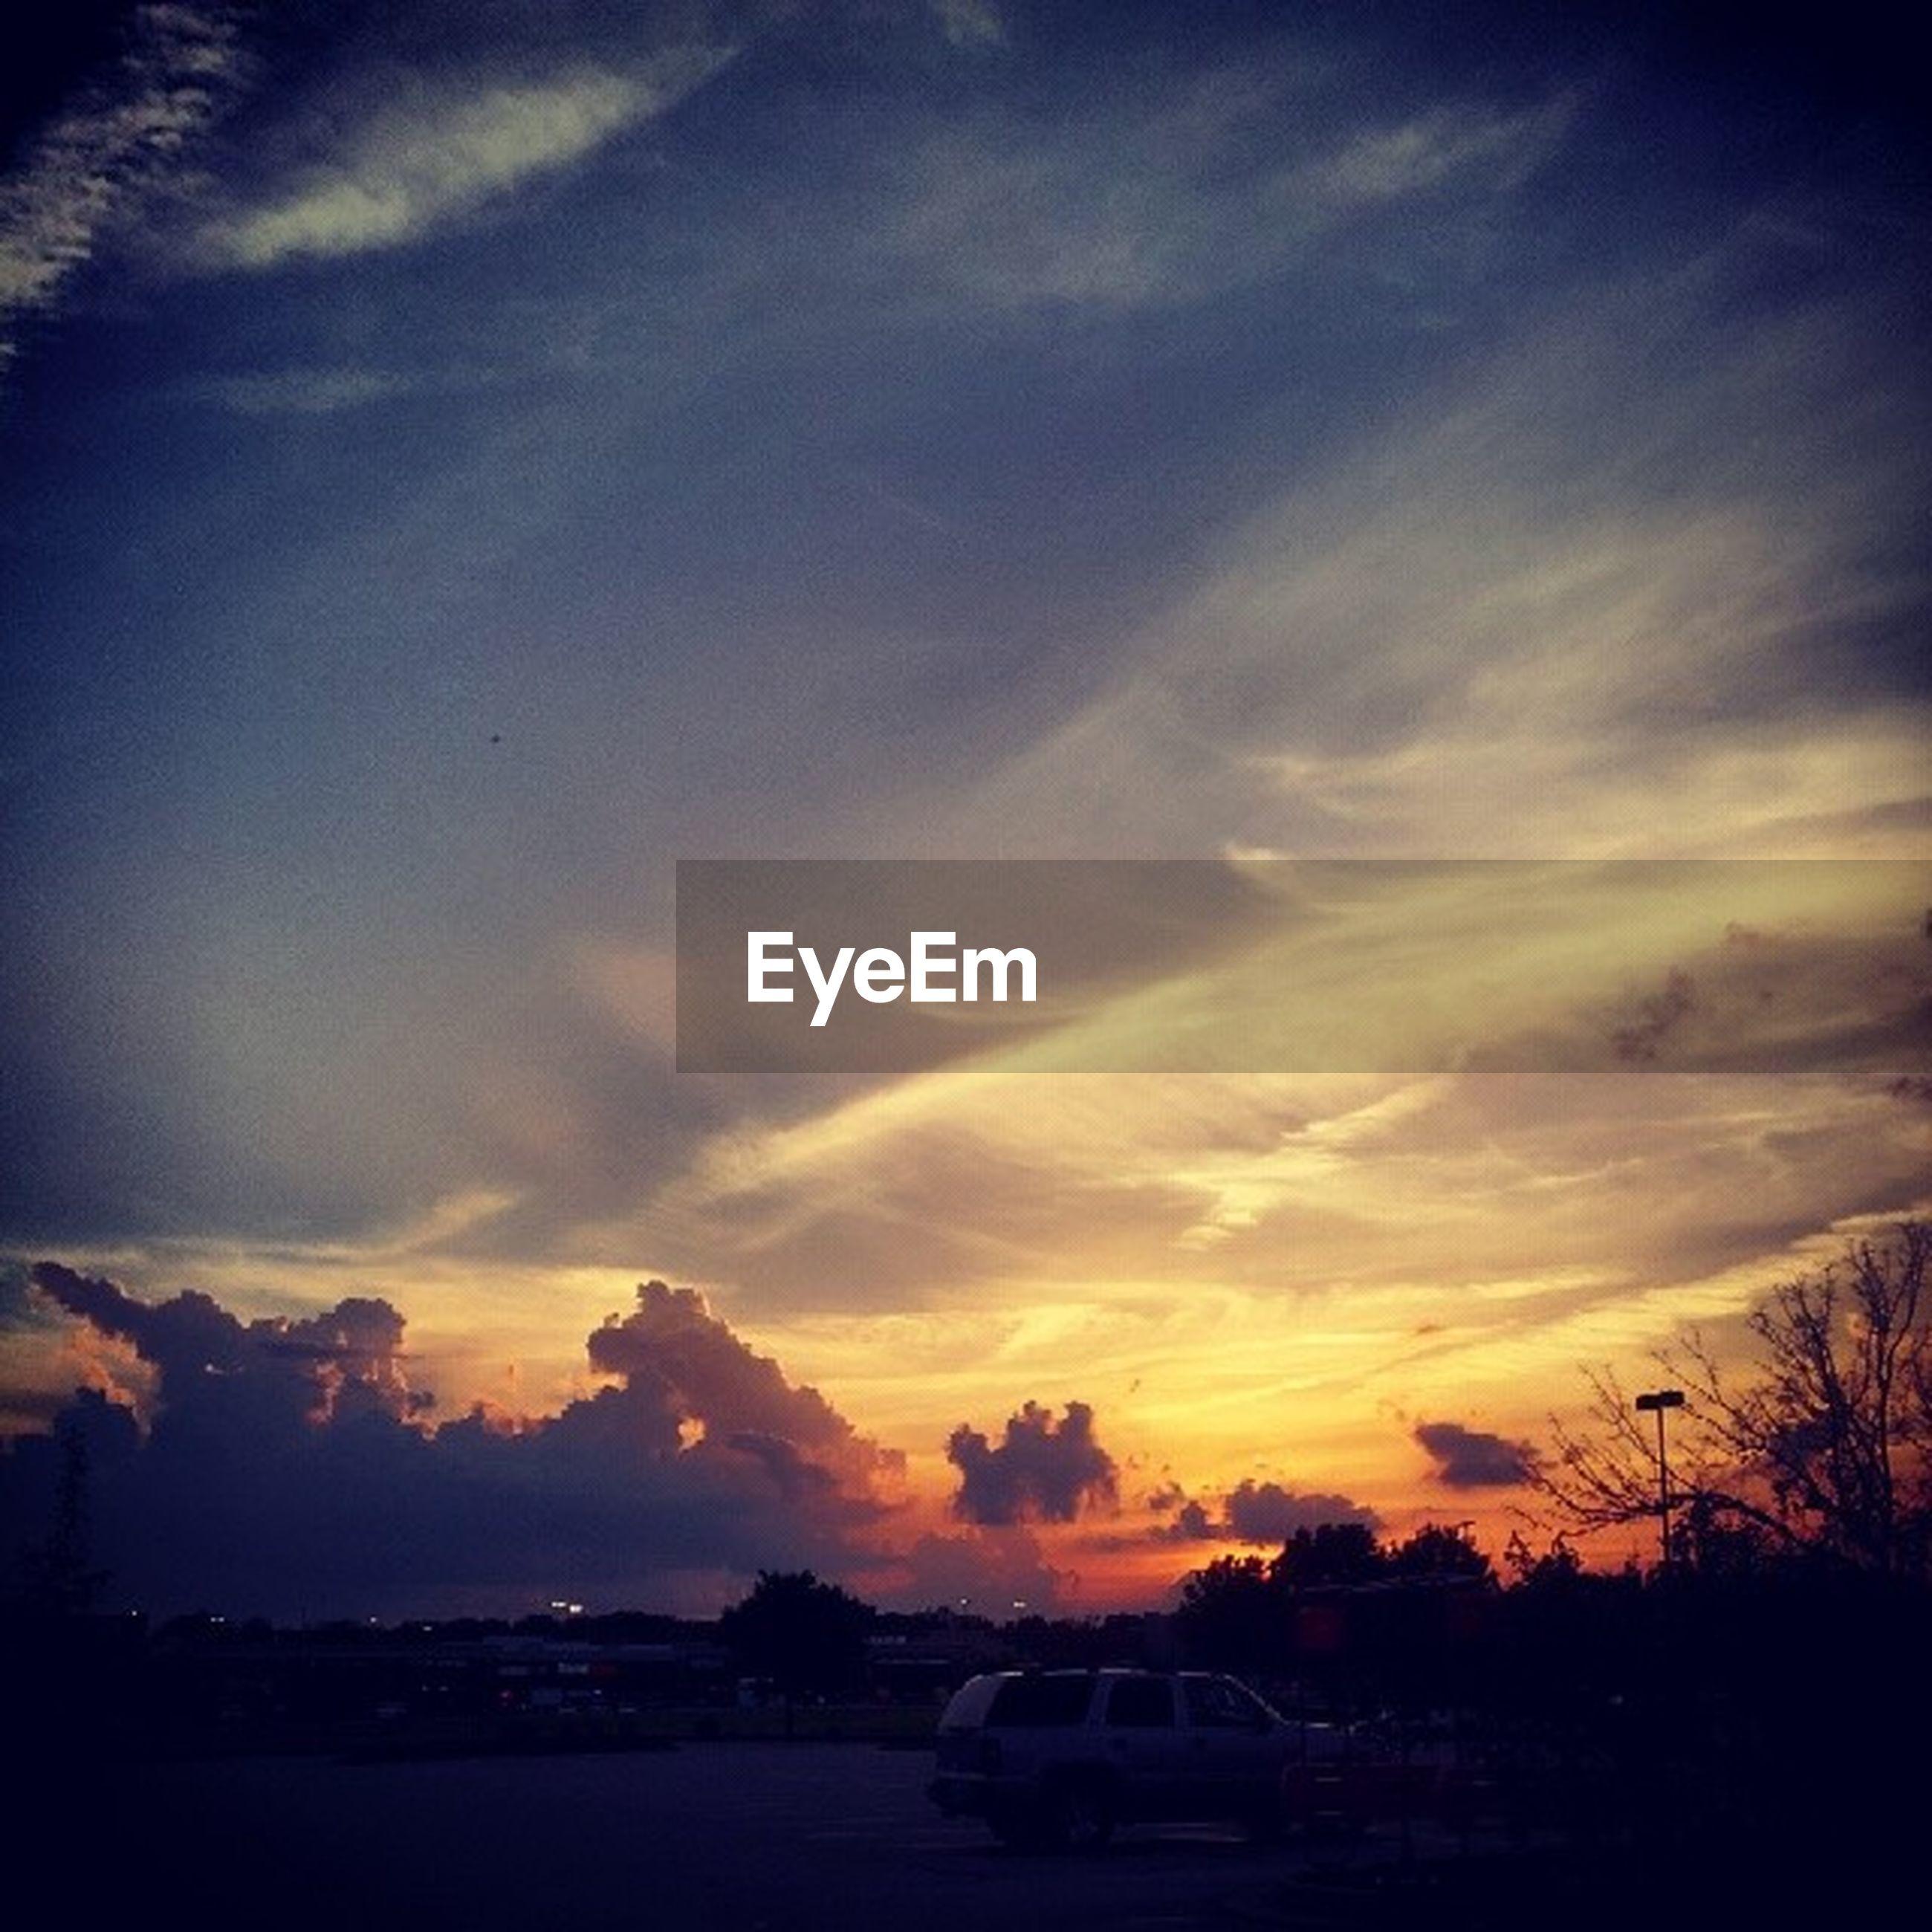 sunset, silhouette, sky, tree, scenics, tranquil scene, tranquility, beauty in nature, cloud - sky, orange color, nature, landscape, idyllic, cloud, dusk, outdoors, dramatic sky, dark, no people, transportation